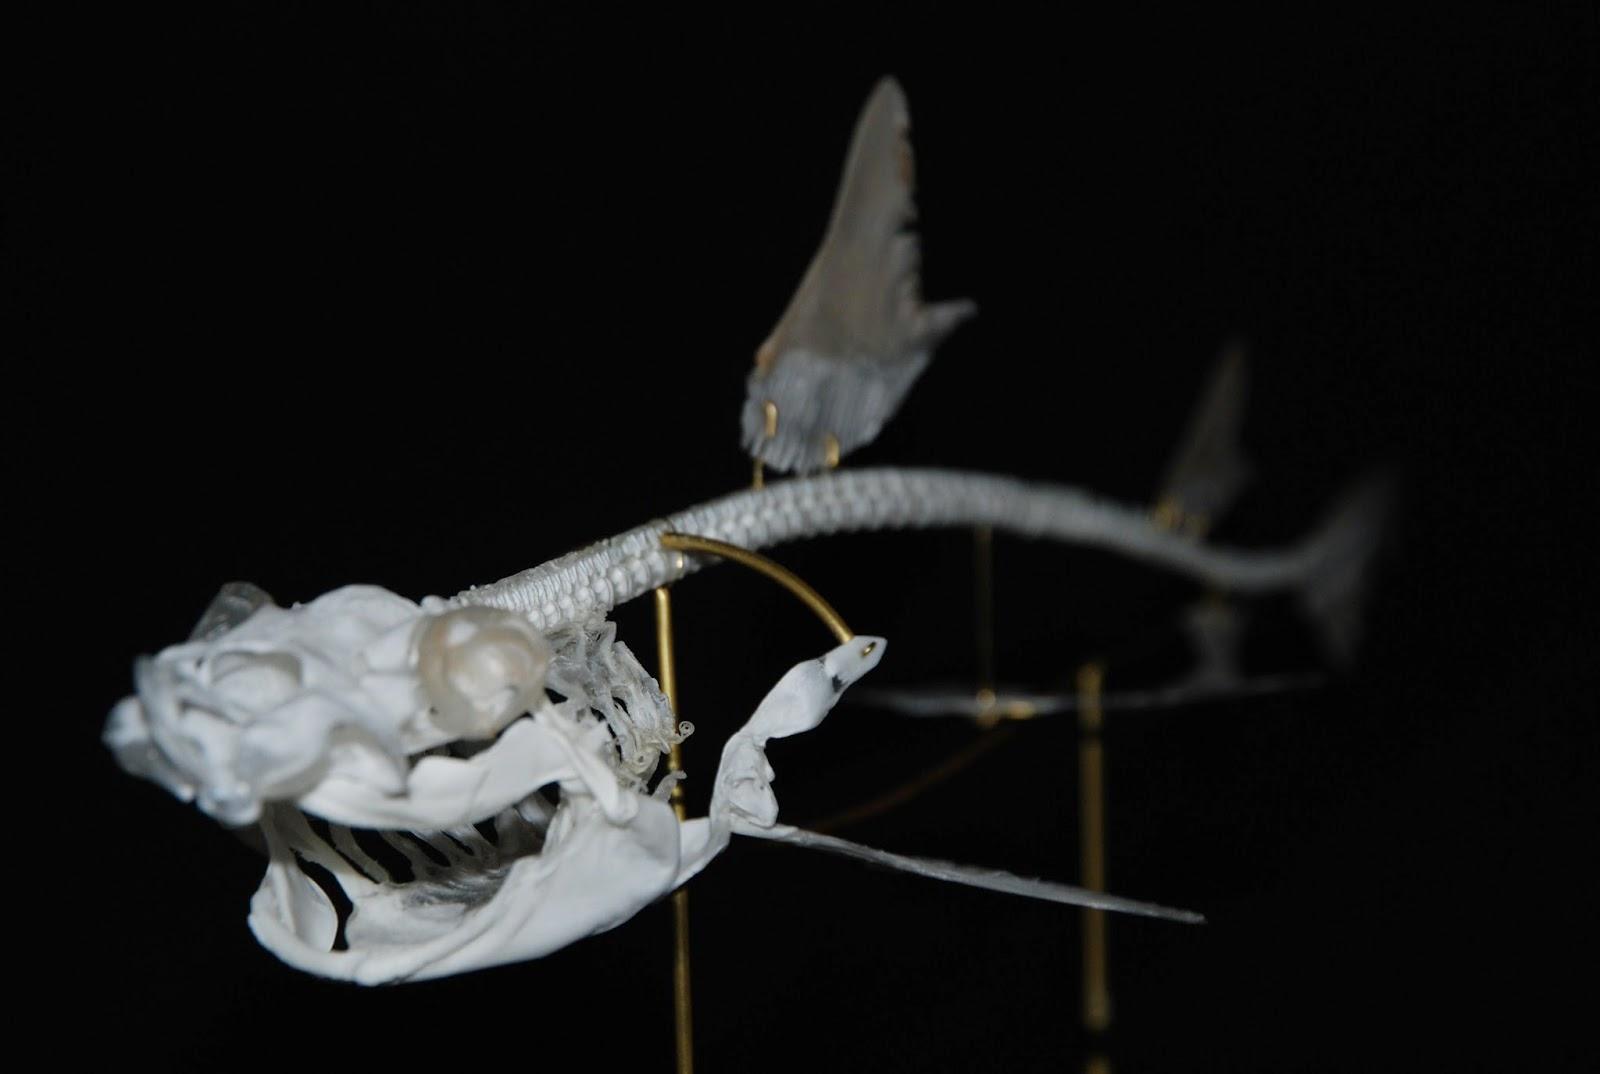 Shark Skeleton Diagram 2002 Nissan Xterra Car Stereo Wiring The Gallery For Gt Great White